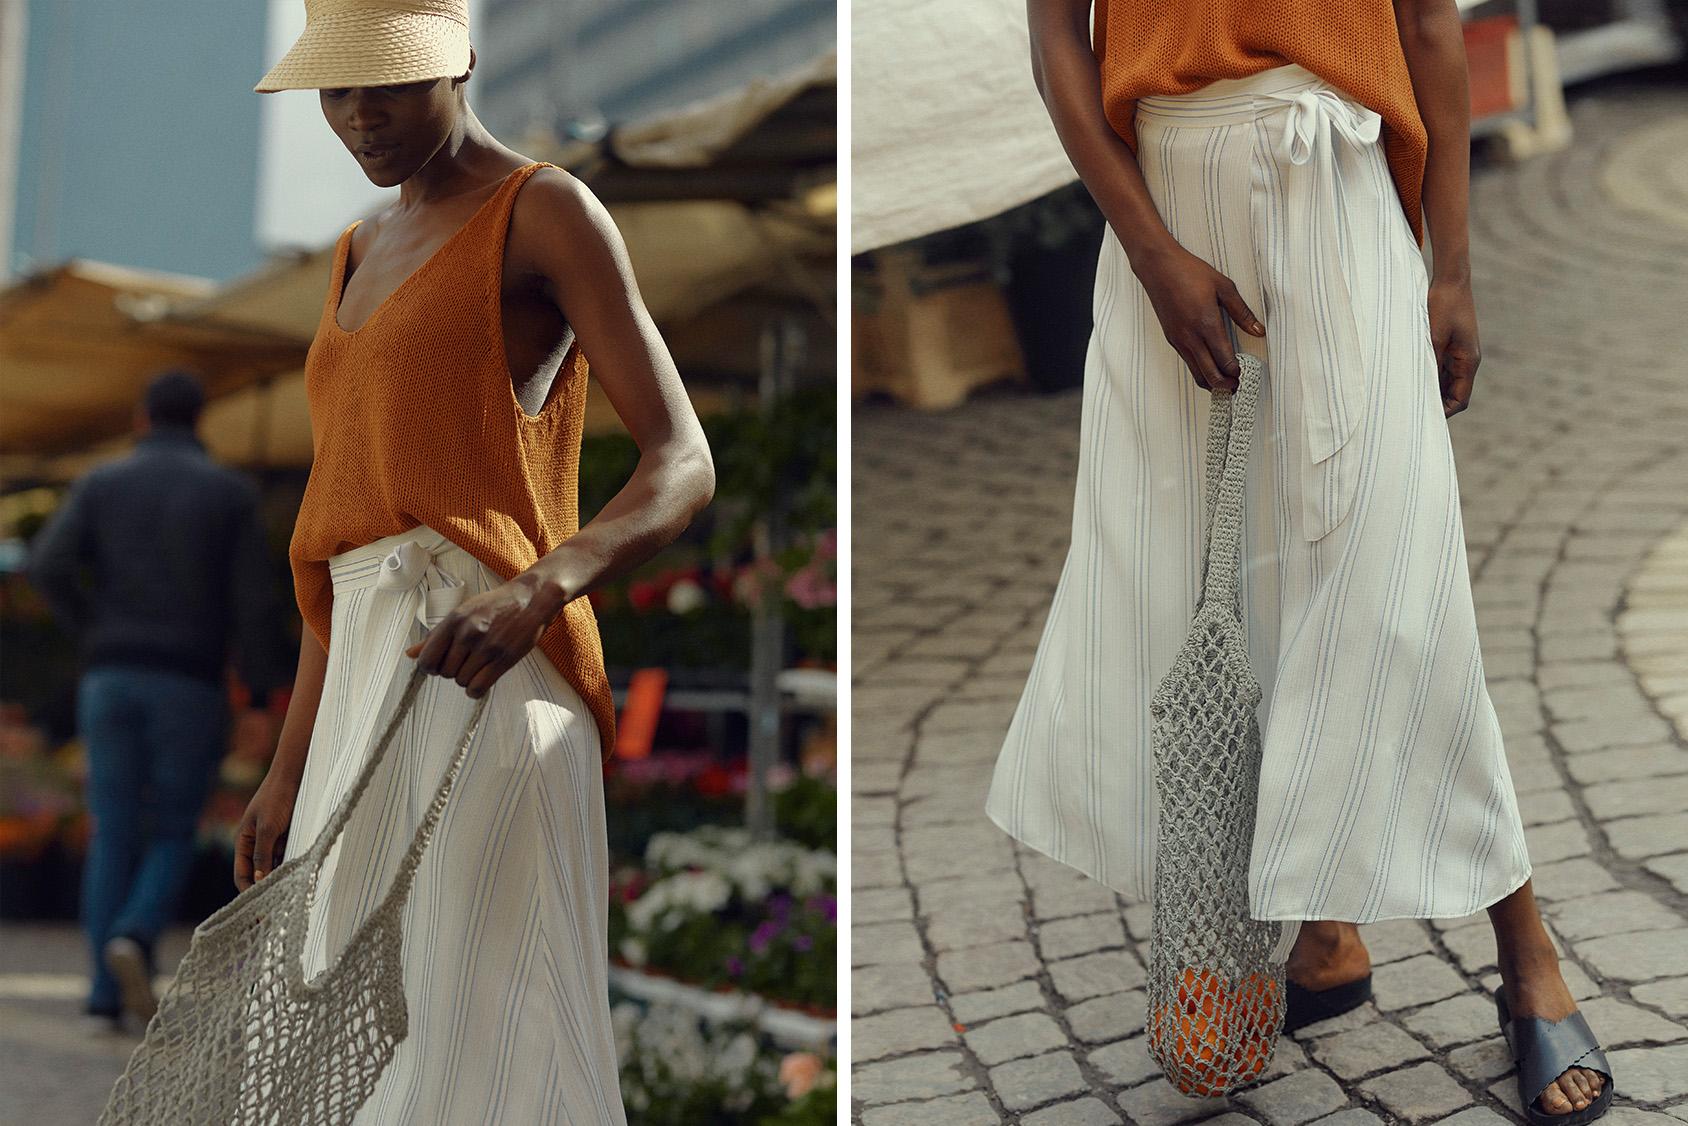 H&M straw sun visor and H&M net bag